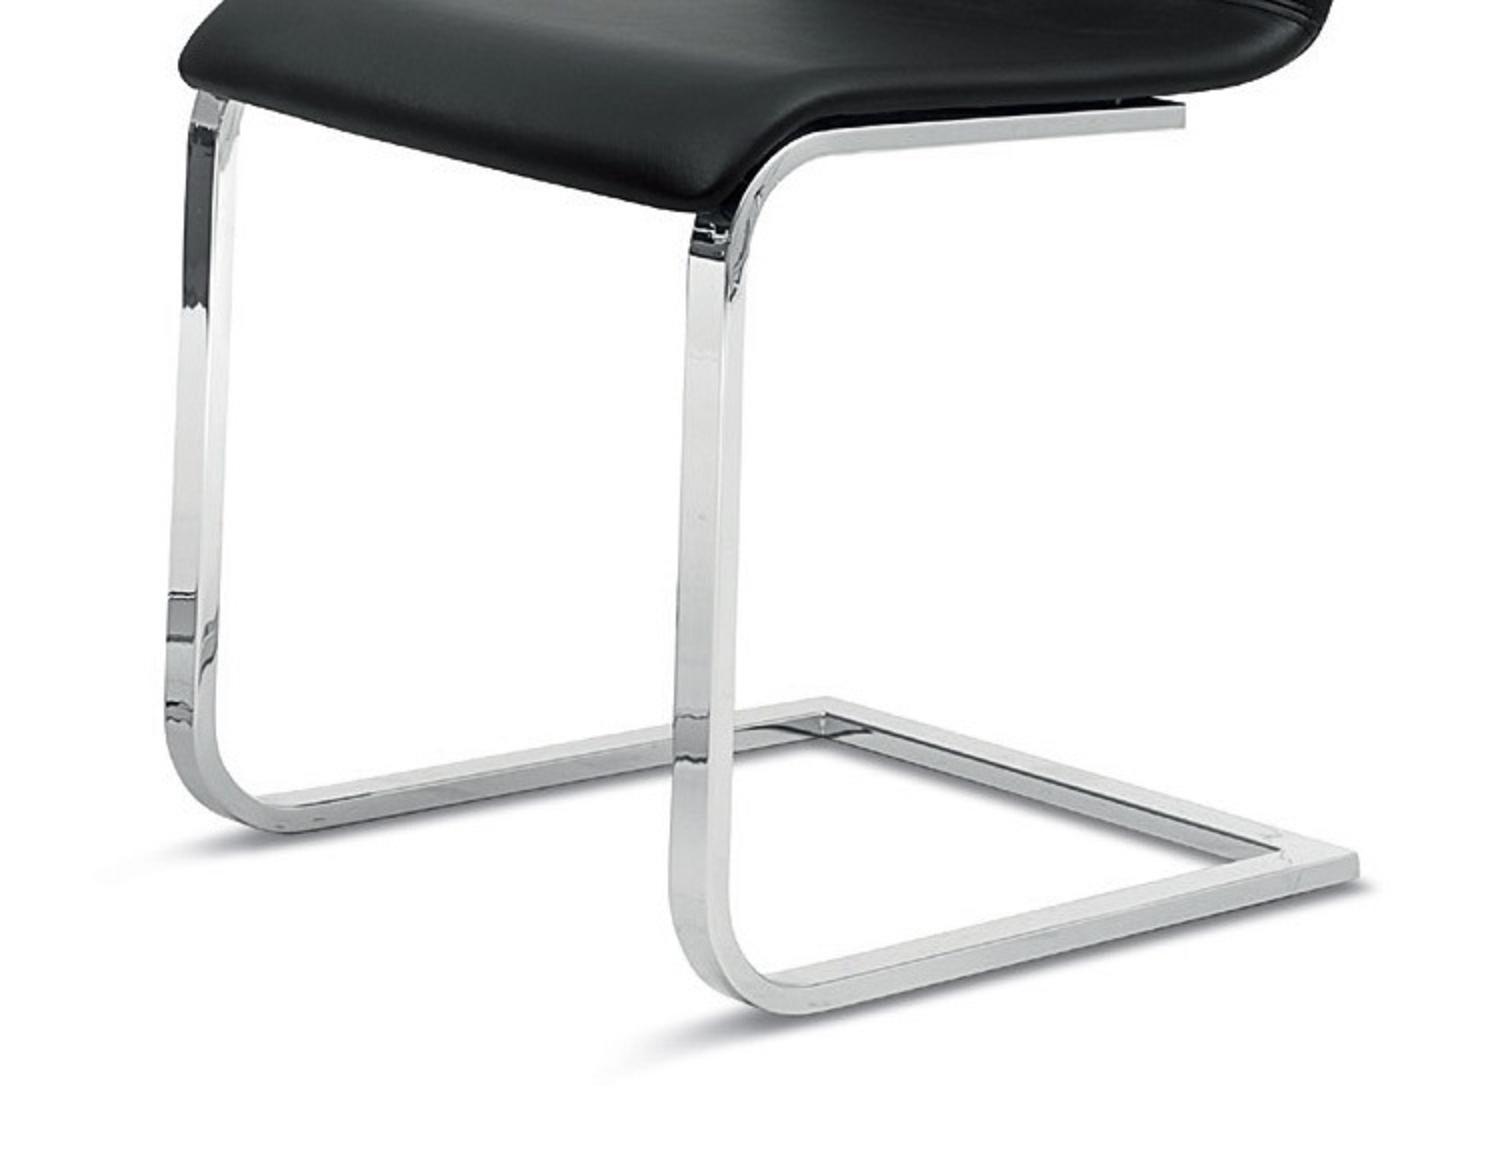 Sedie jude s domitalia scontate del 30 sedie a prezzi for Sedie moderne outlet